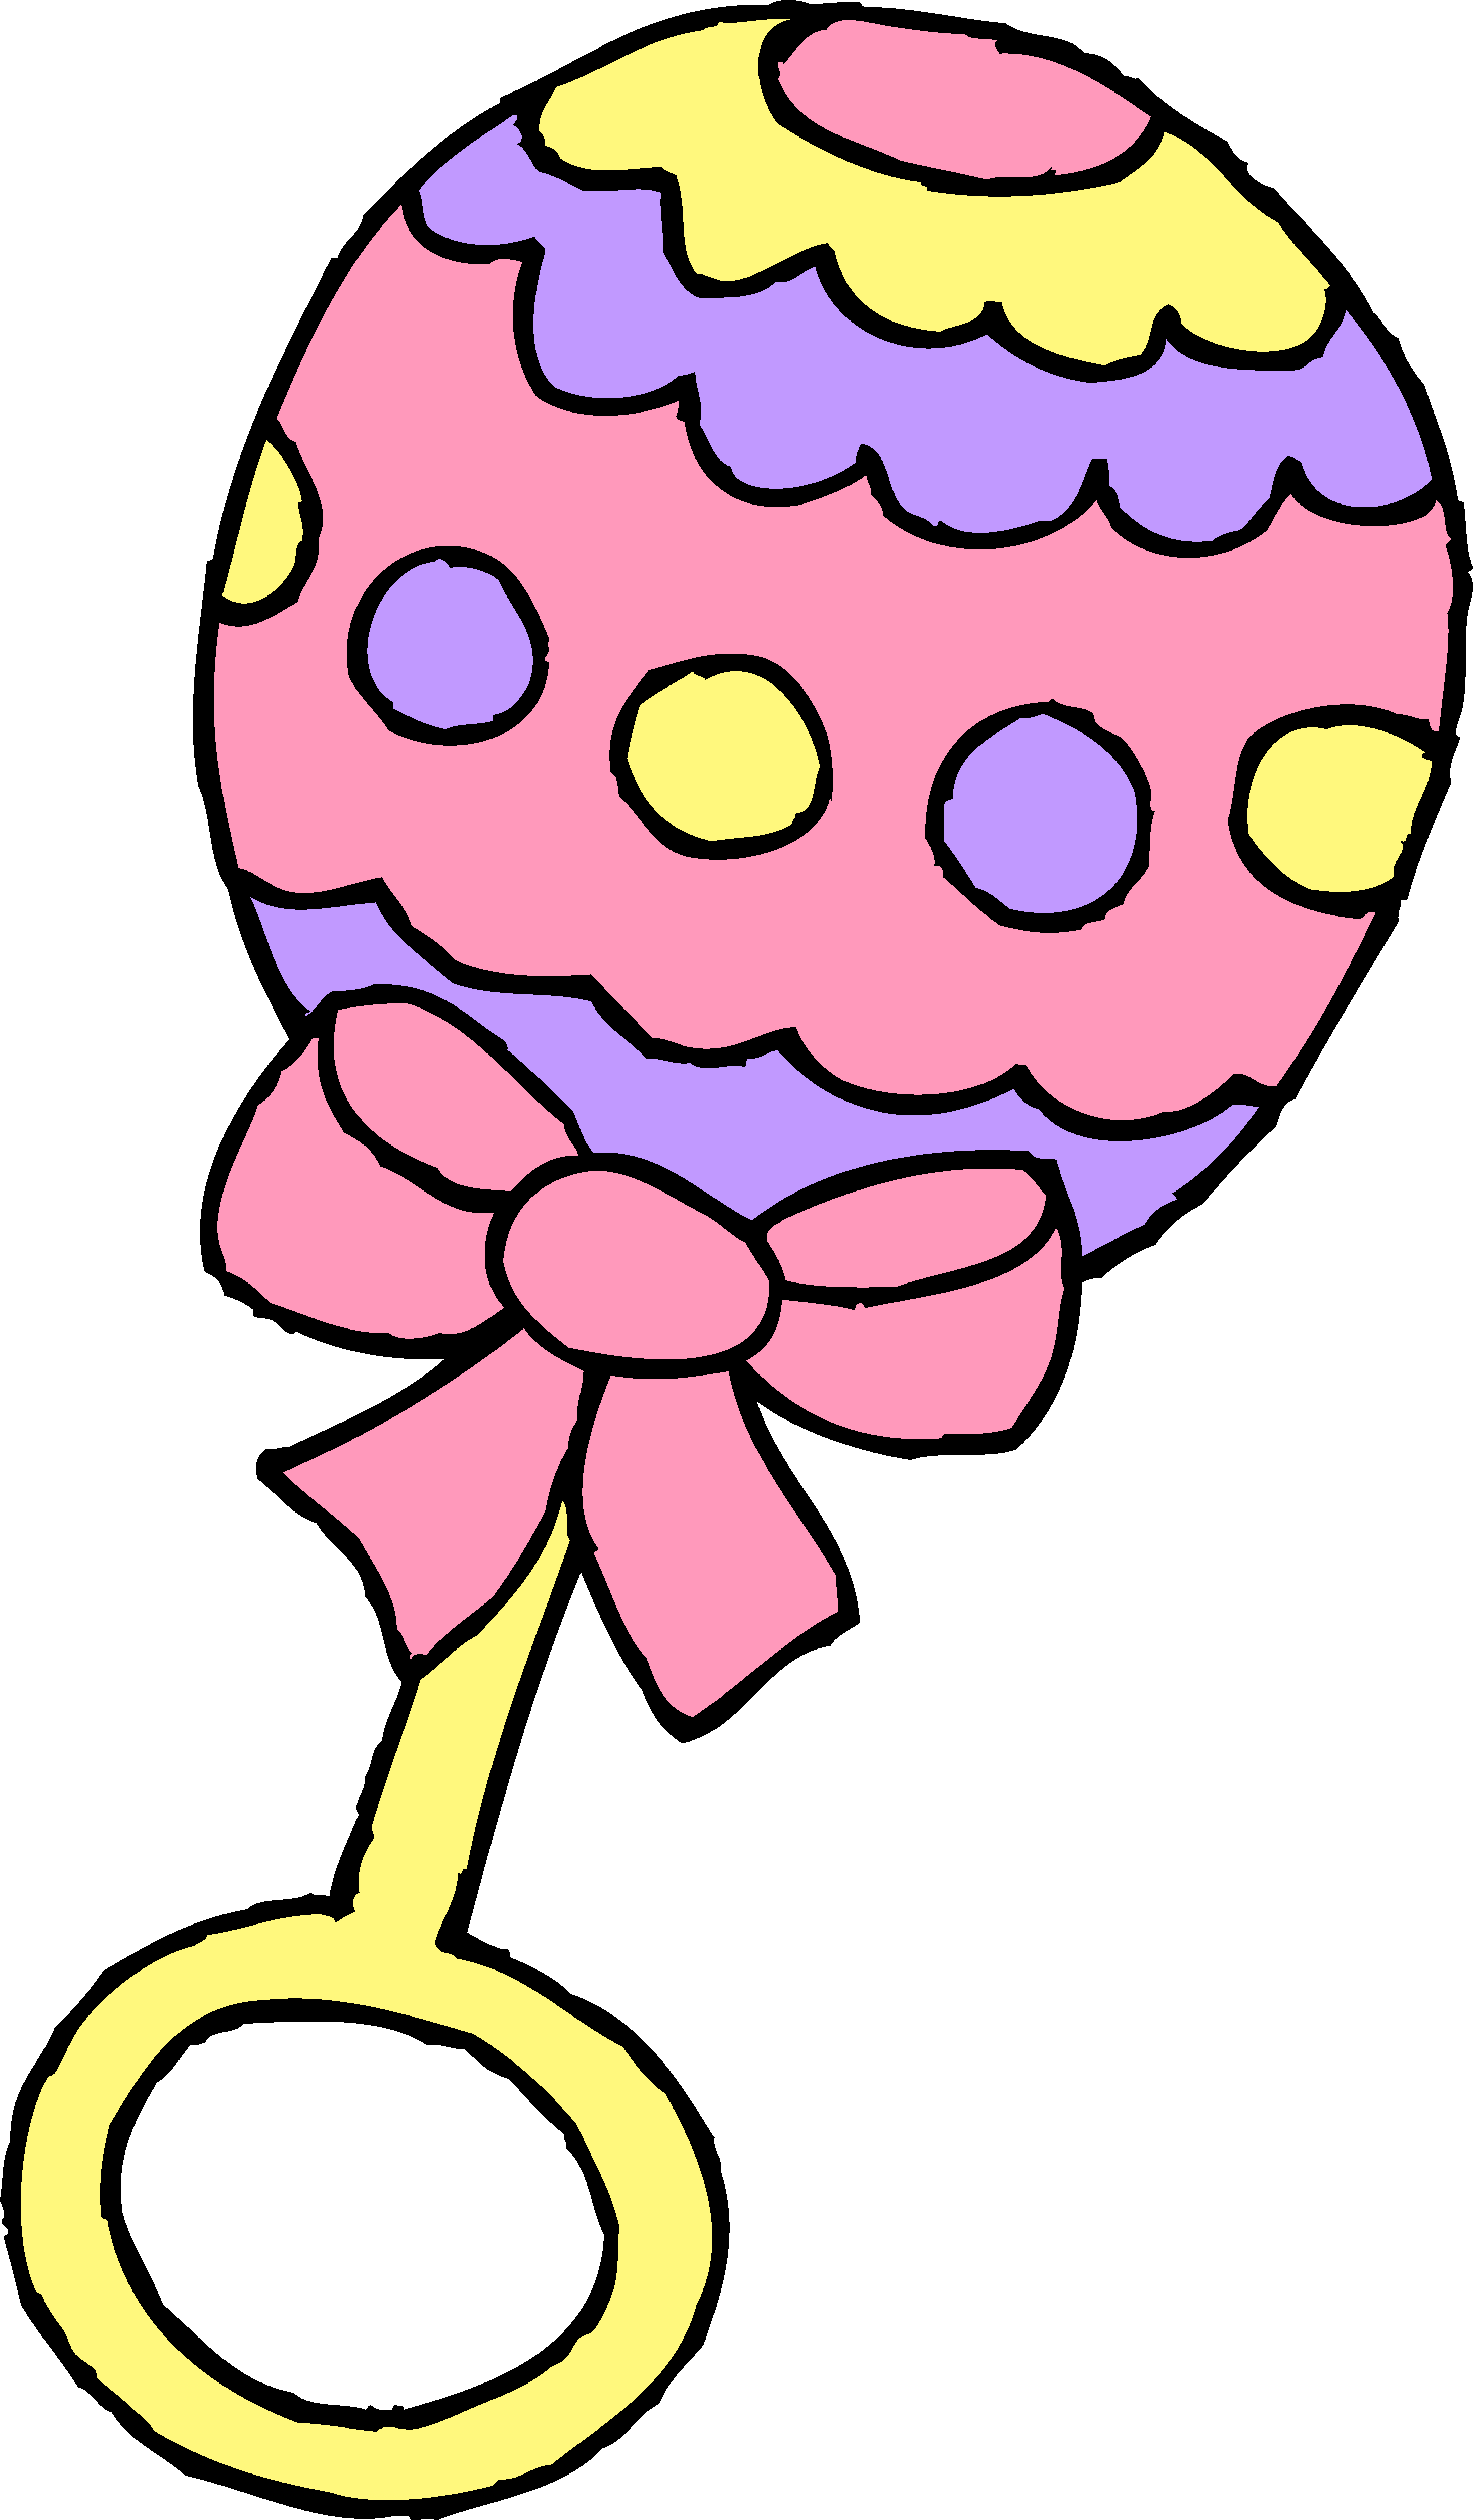 Pink Baby Bottle Clip Art - ClipArt Best